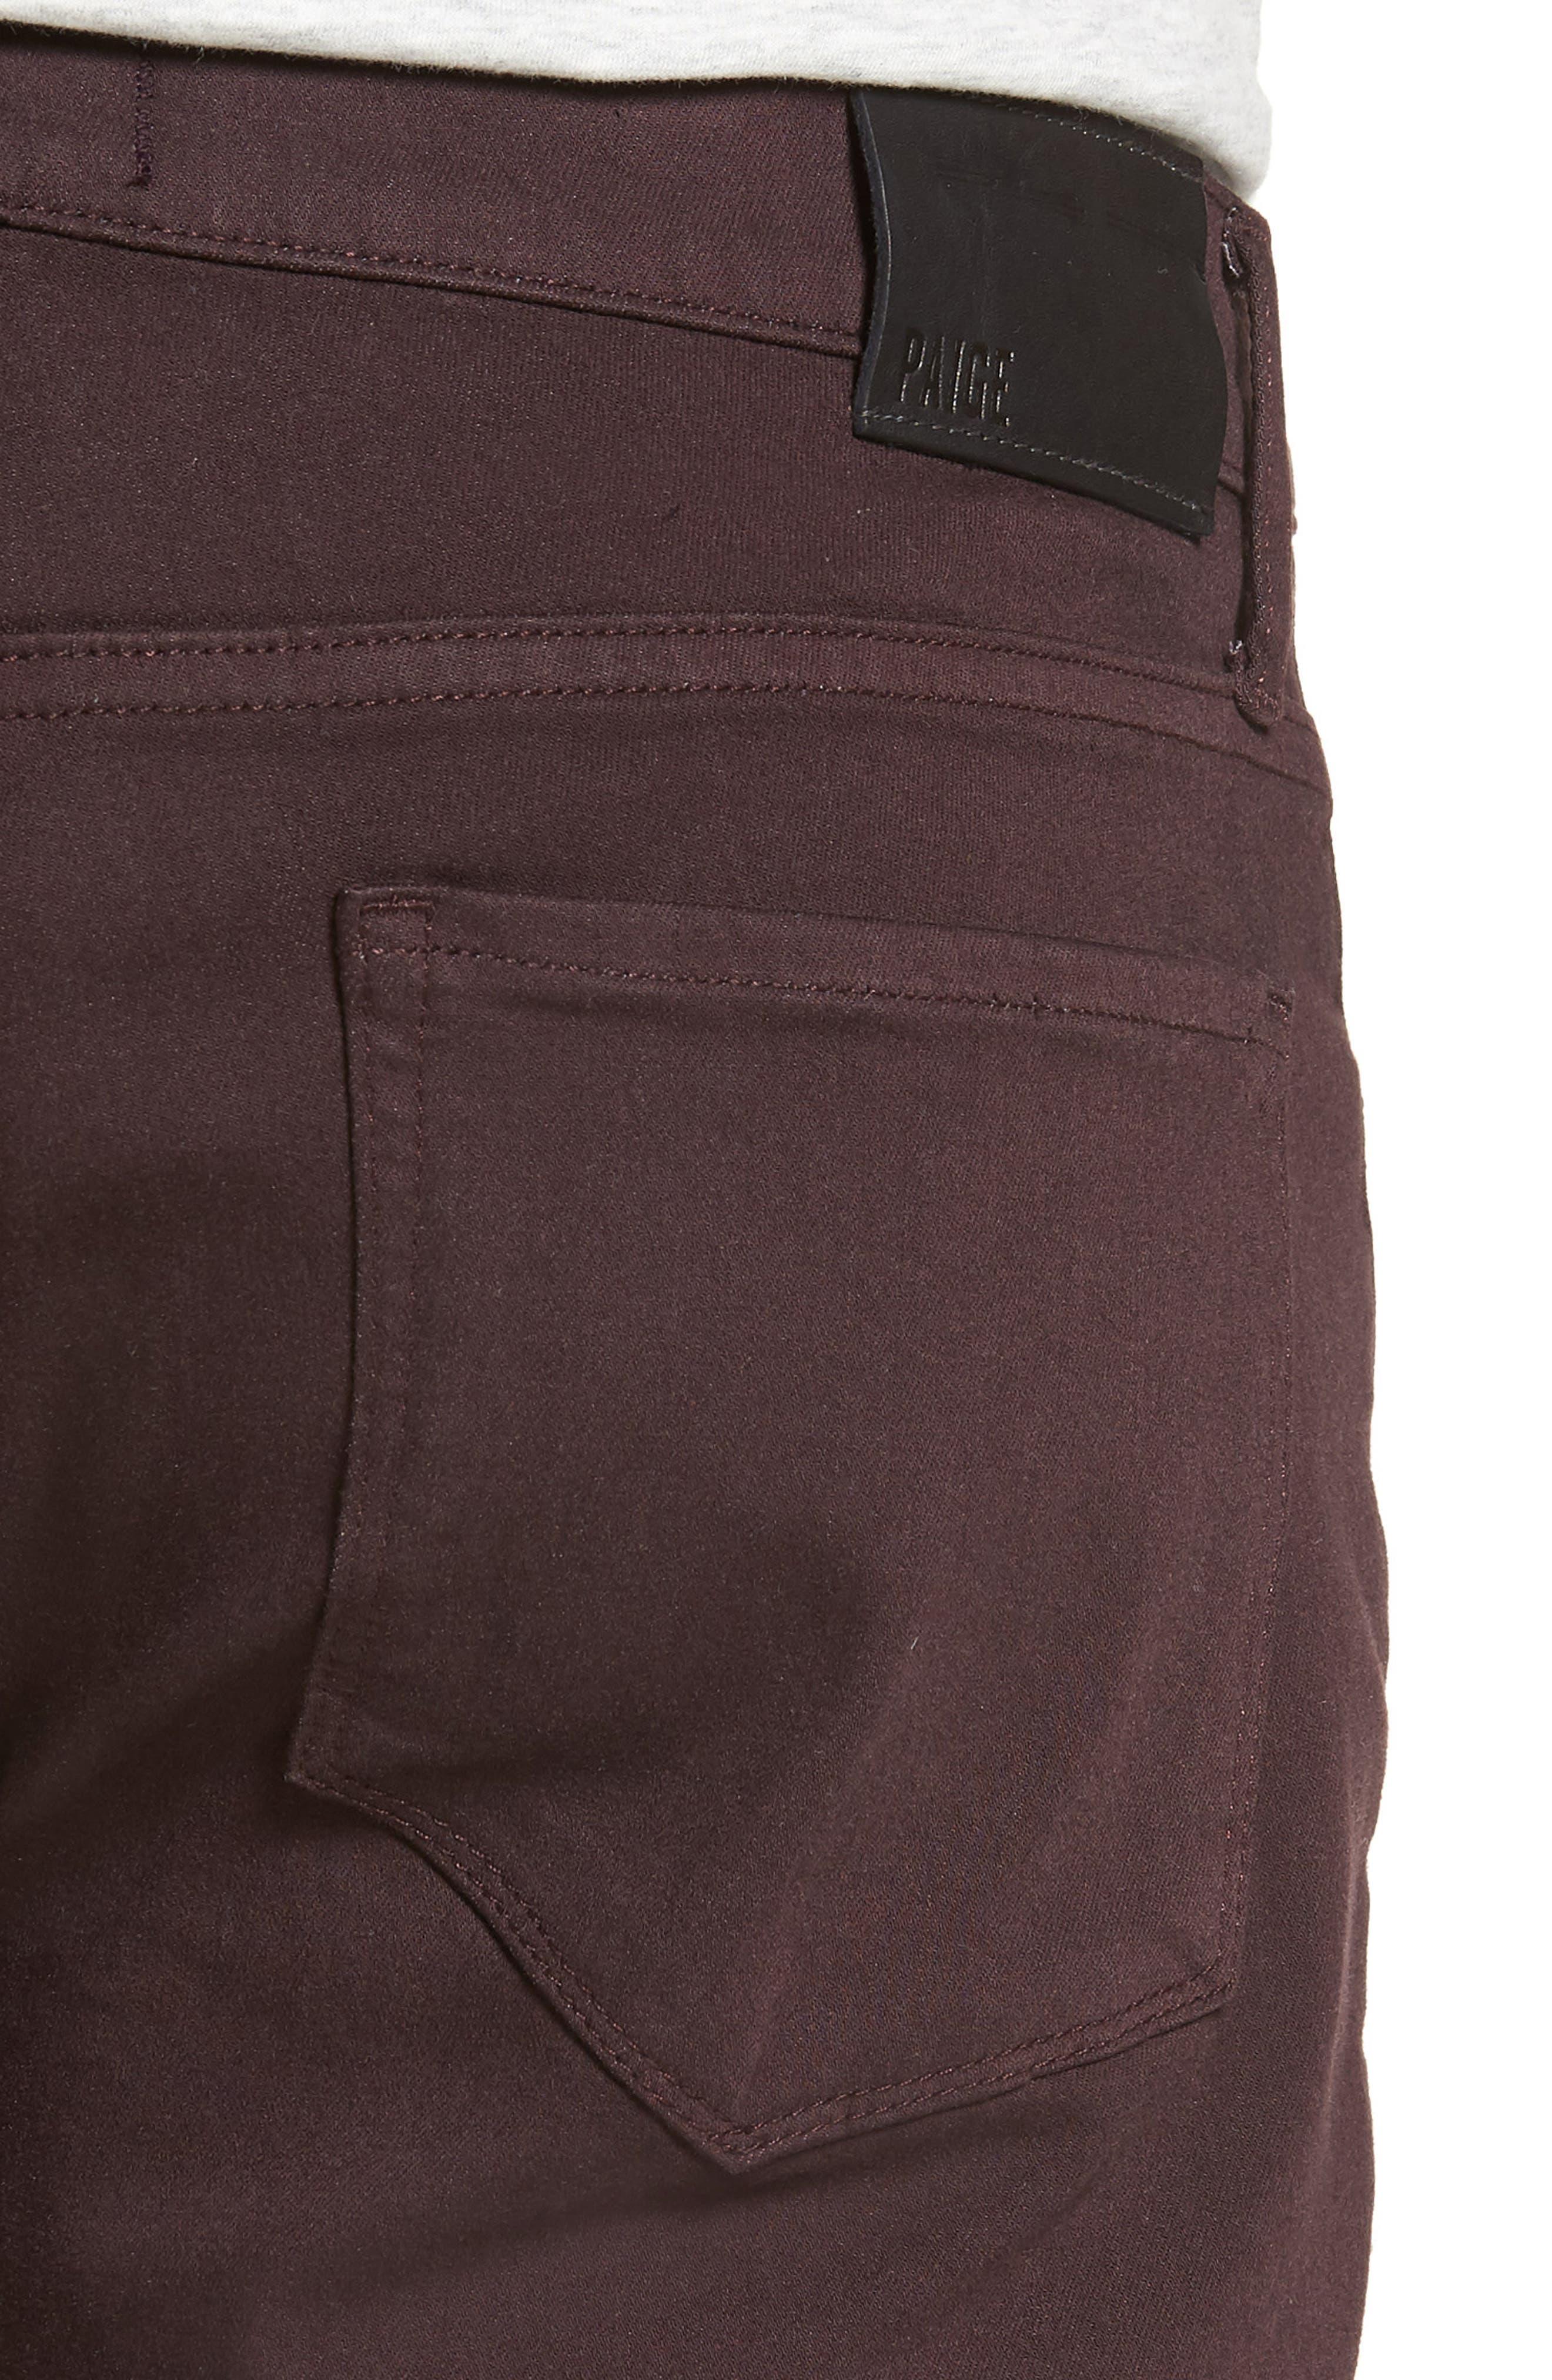 Transcend - Federal Silm Straight Fit Jeans,                             Alternate thumbnail 4, color,                             DARK PORT